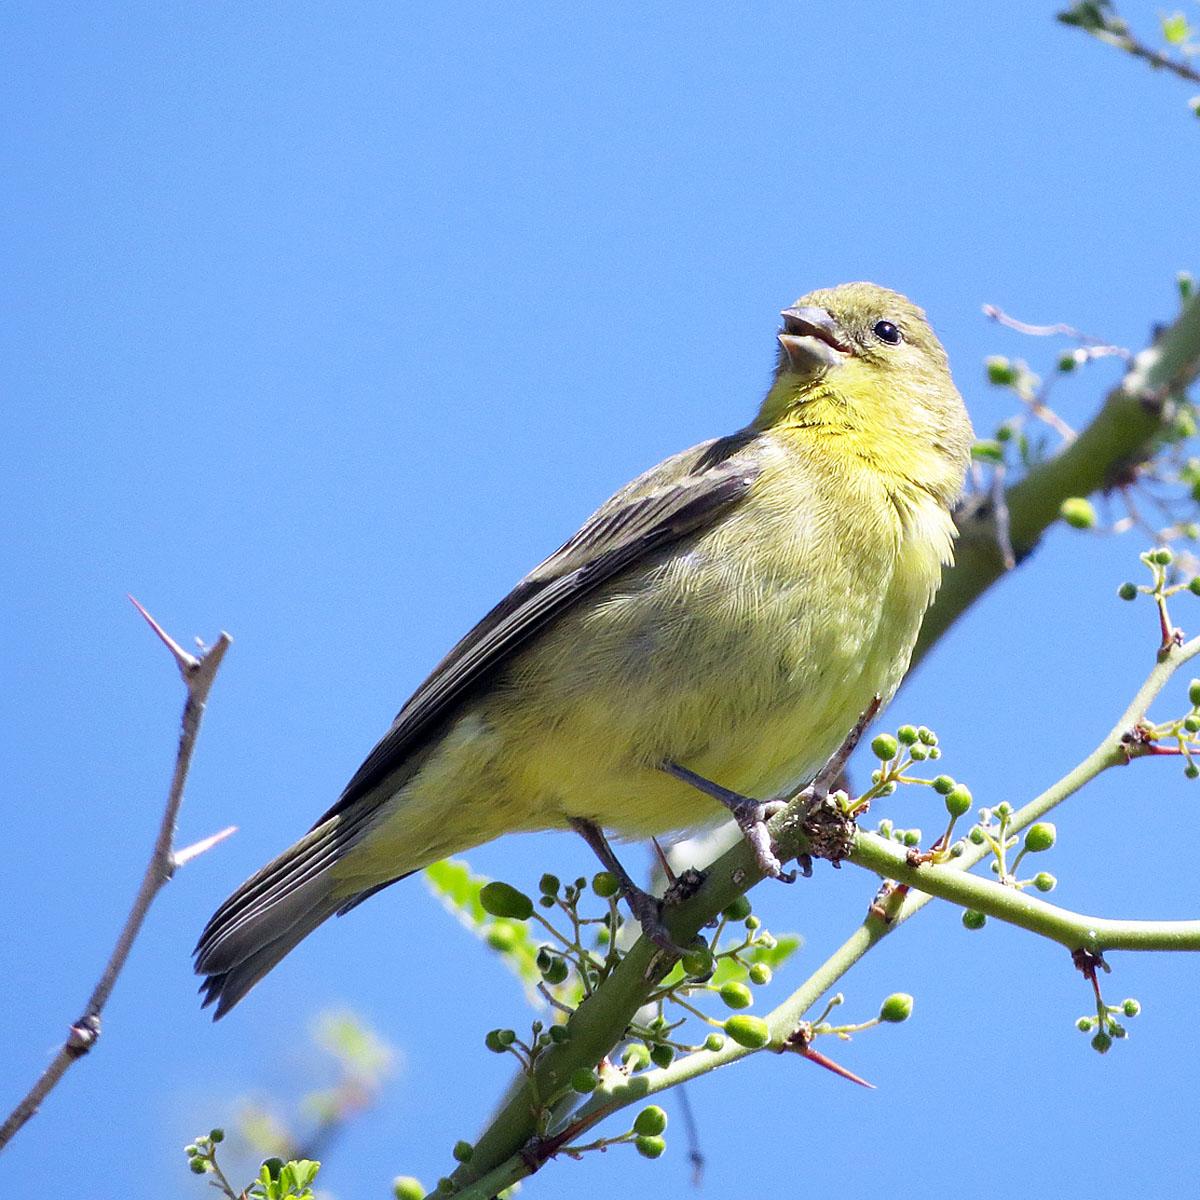 U.S. Desert Songbirds at Risk in a Warming Climate | NASA